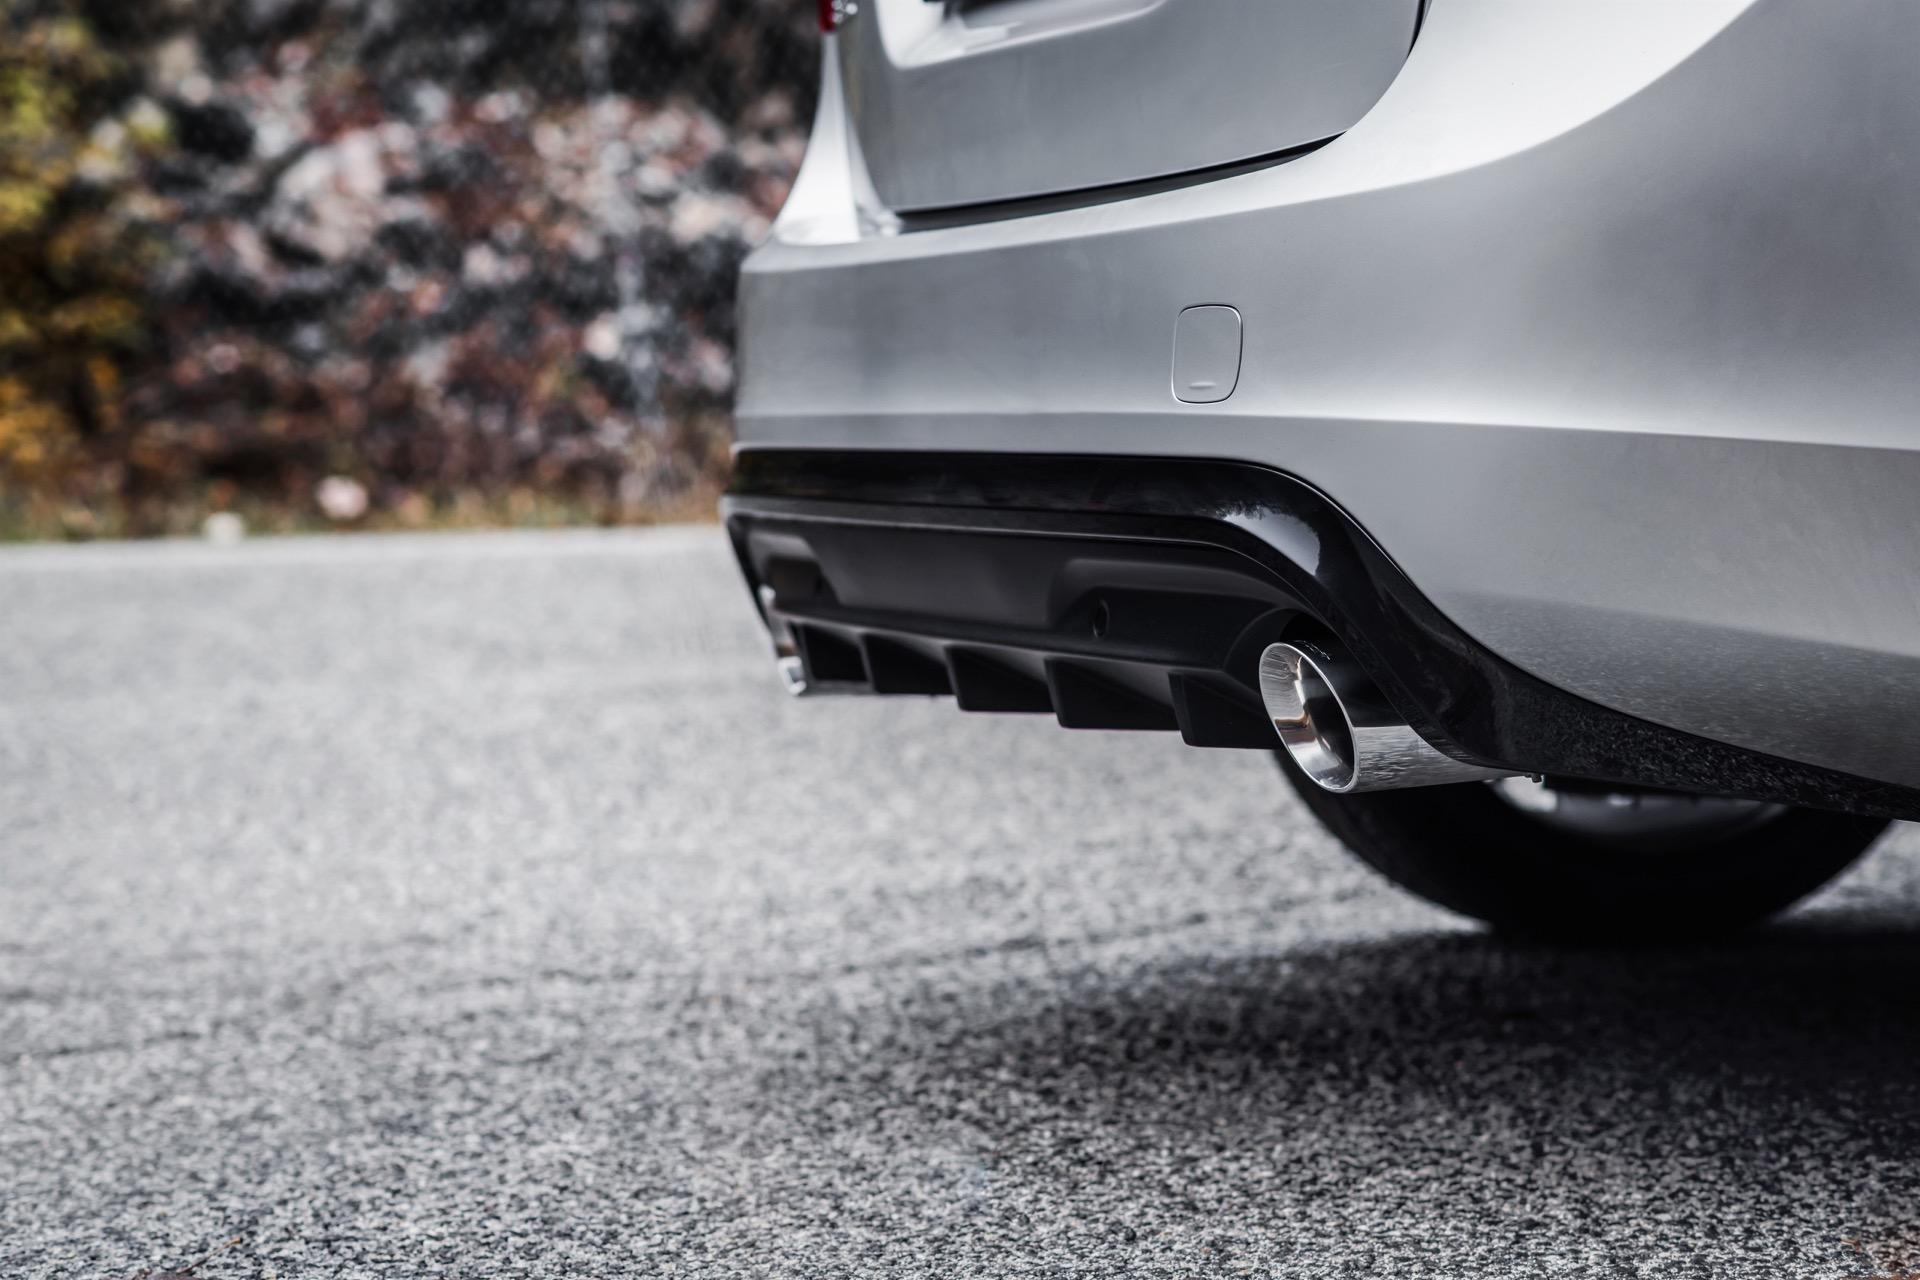 Polestar Parts, Diffusor Volvo S60 -  2016, 2017, 2017 S60, 2018, 2018 S60, Design, Detail, Exterior, Images, Polestar, S60, Volvo